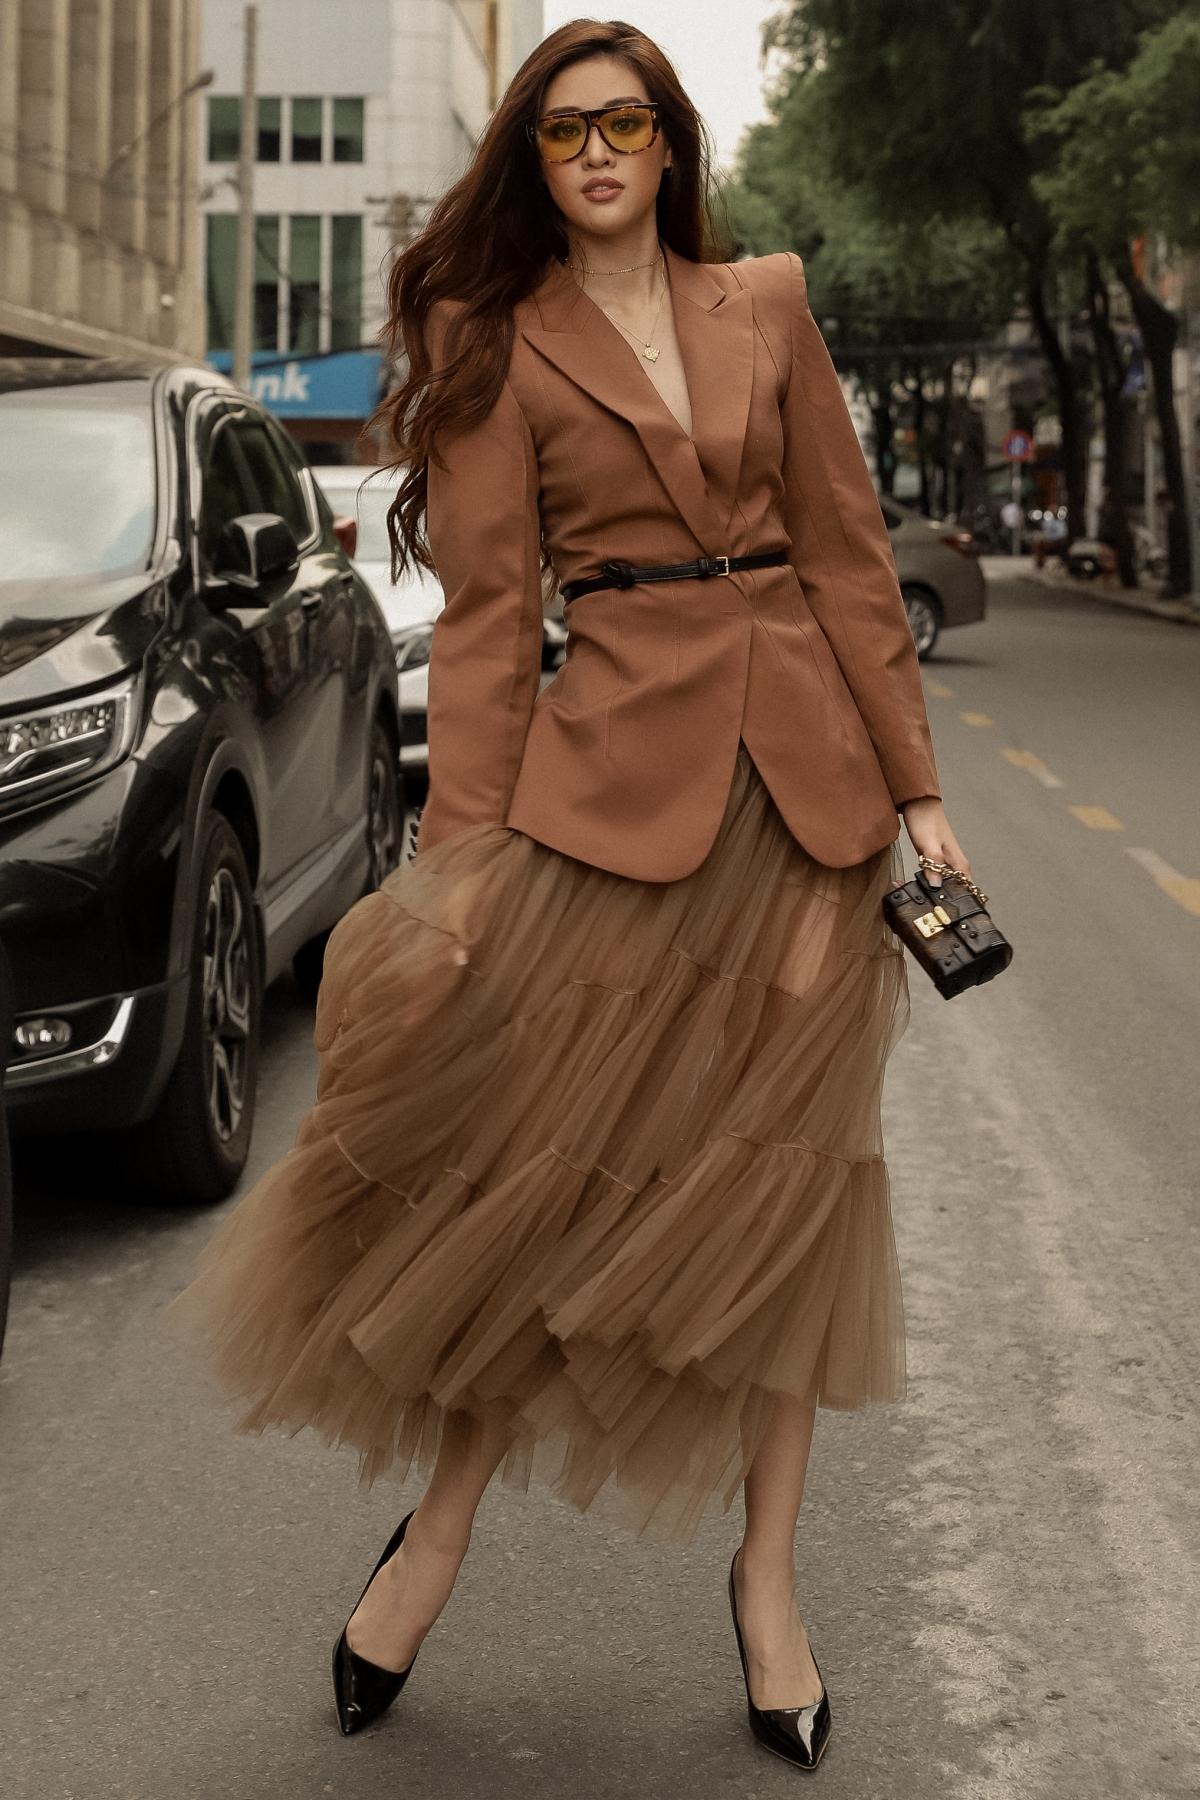 hoa_hau_khanh_van_street_style20_1.jpg